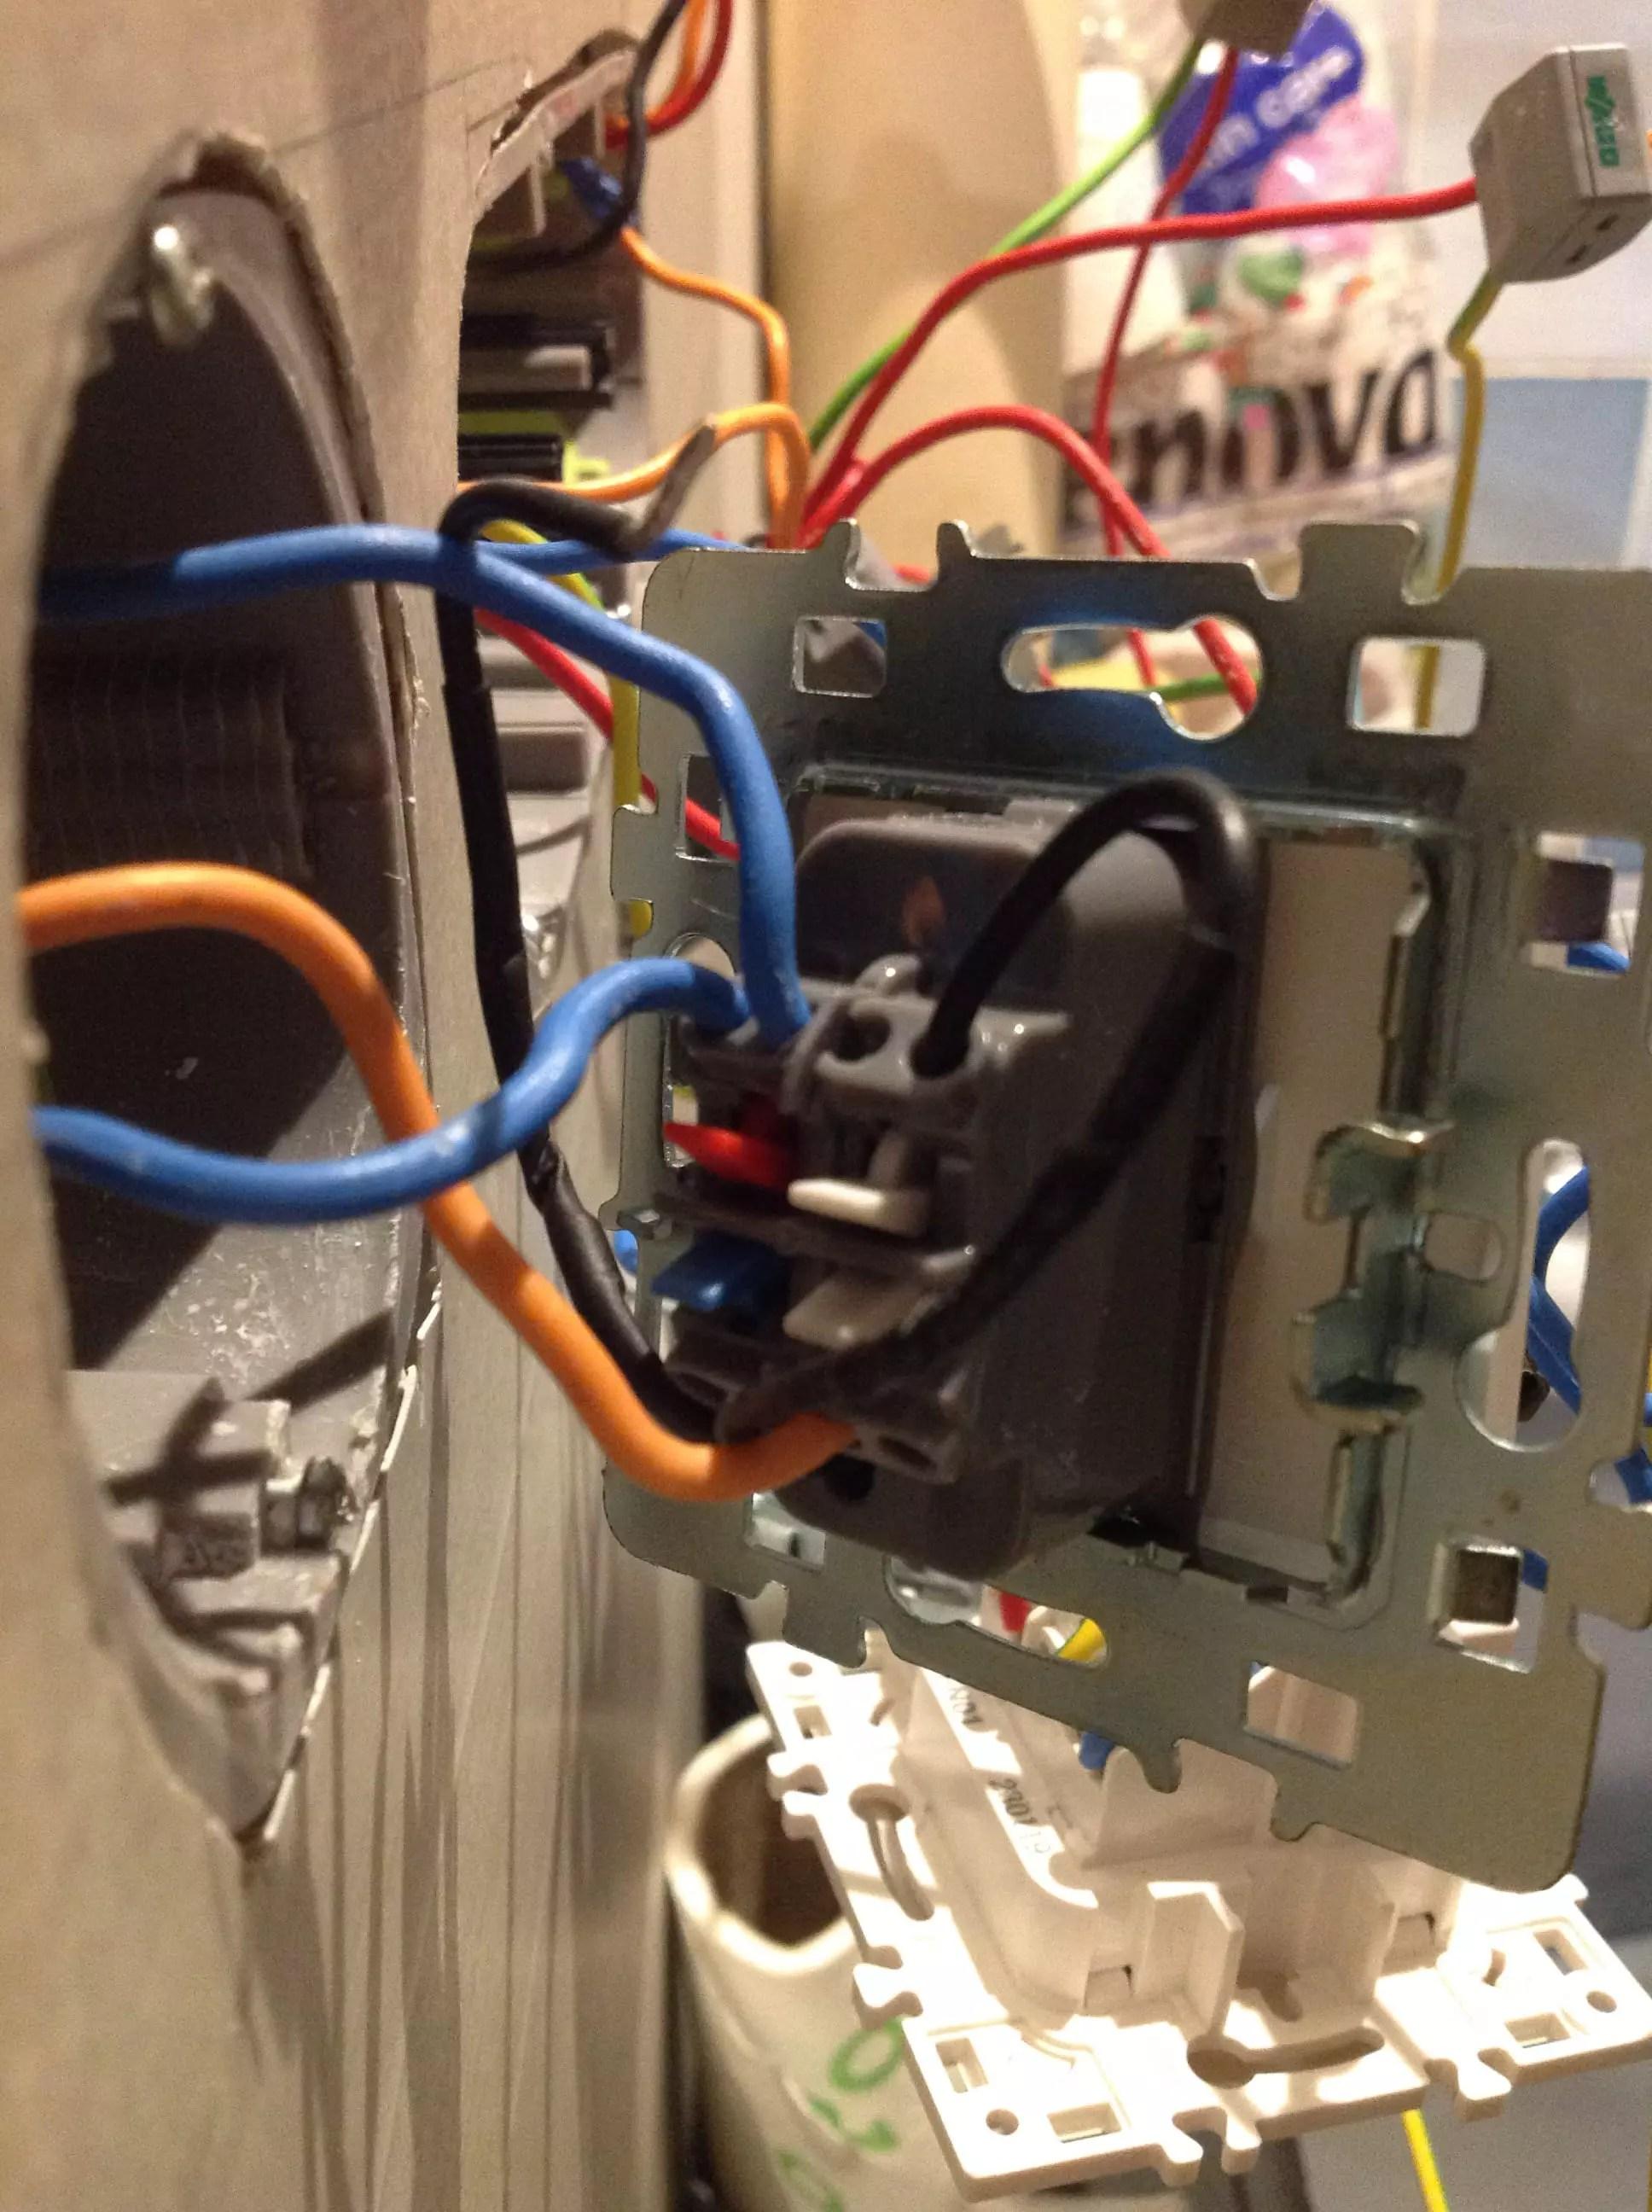 Interrupteur Lexman A Temoin Lumineux Resolu Forum Electricite Linternaute Com